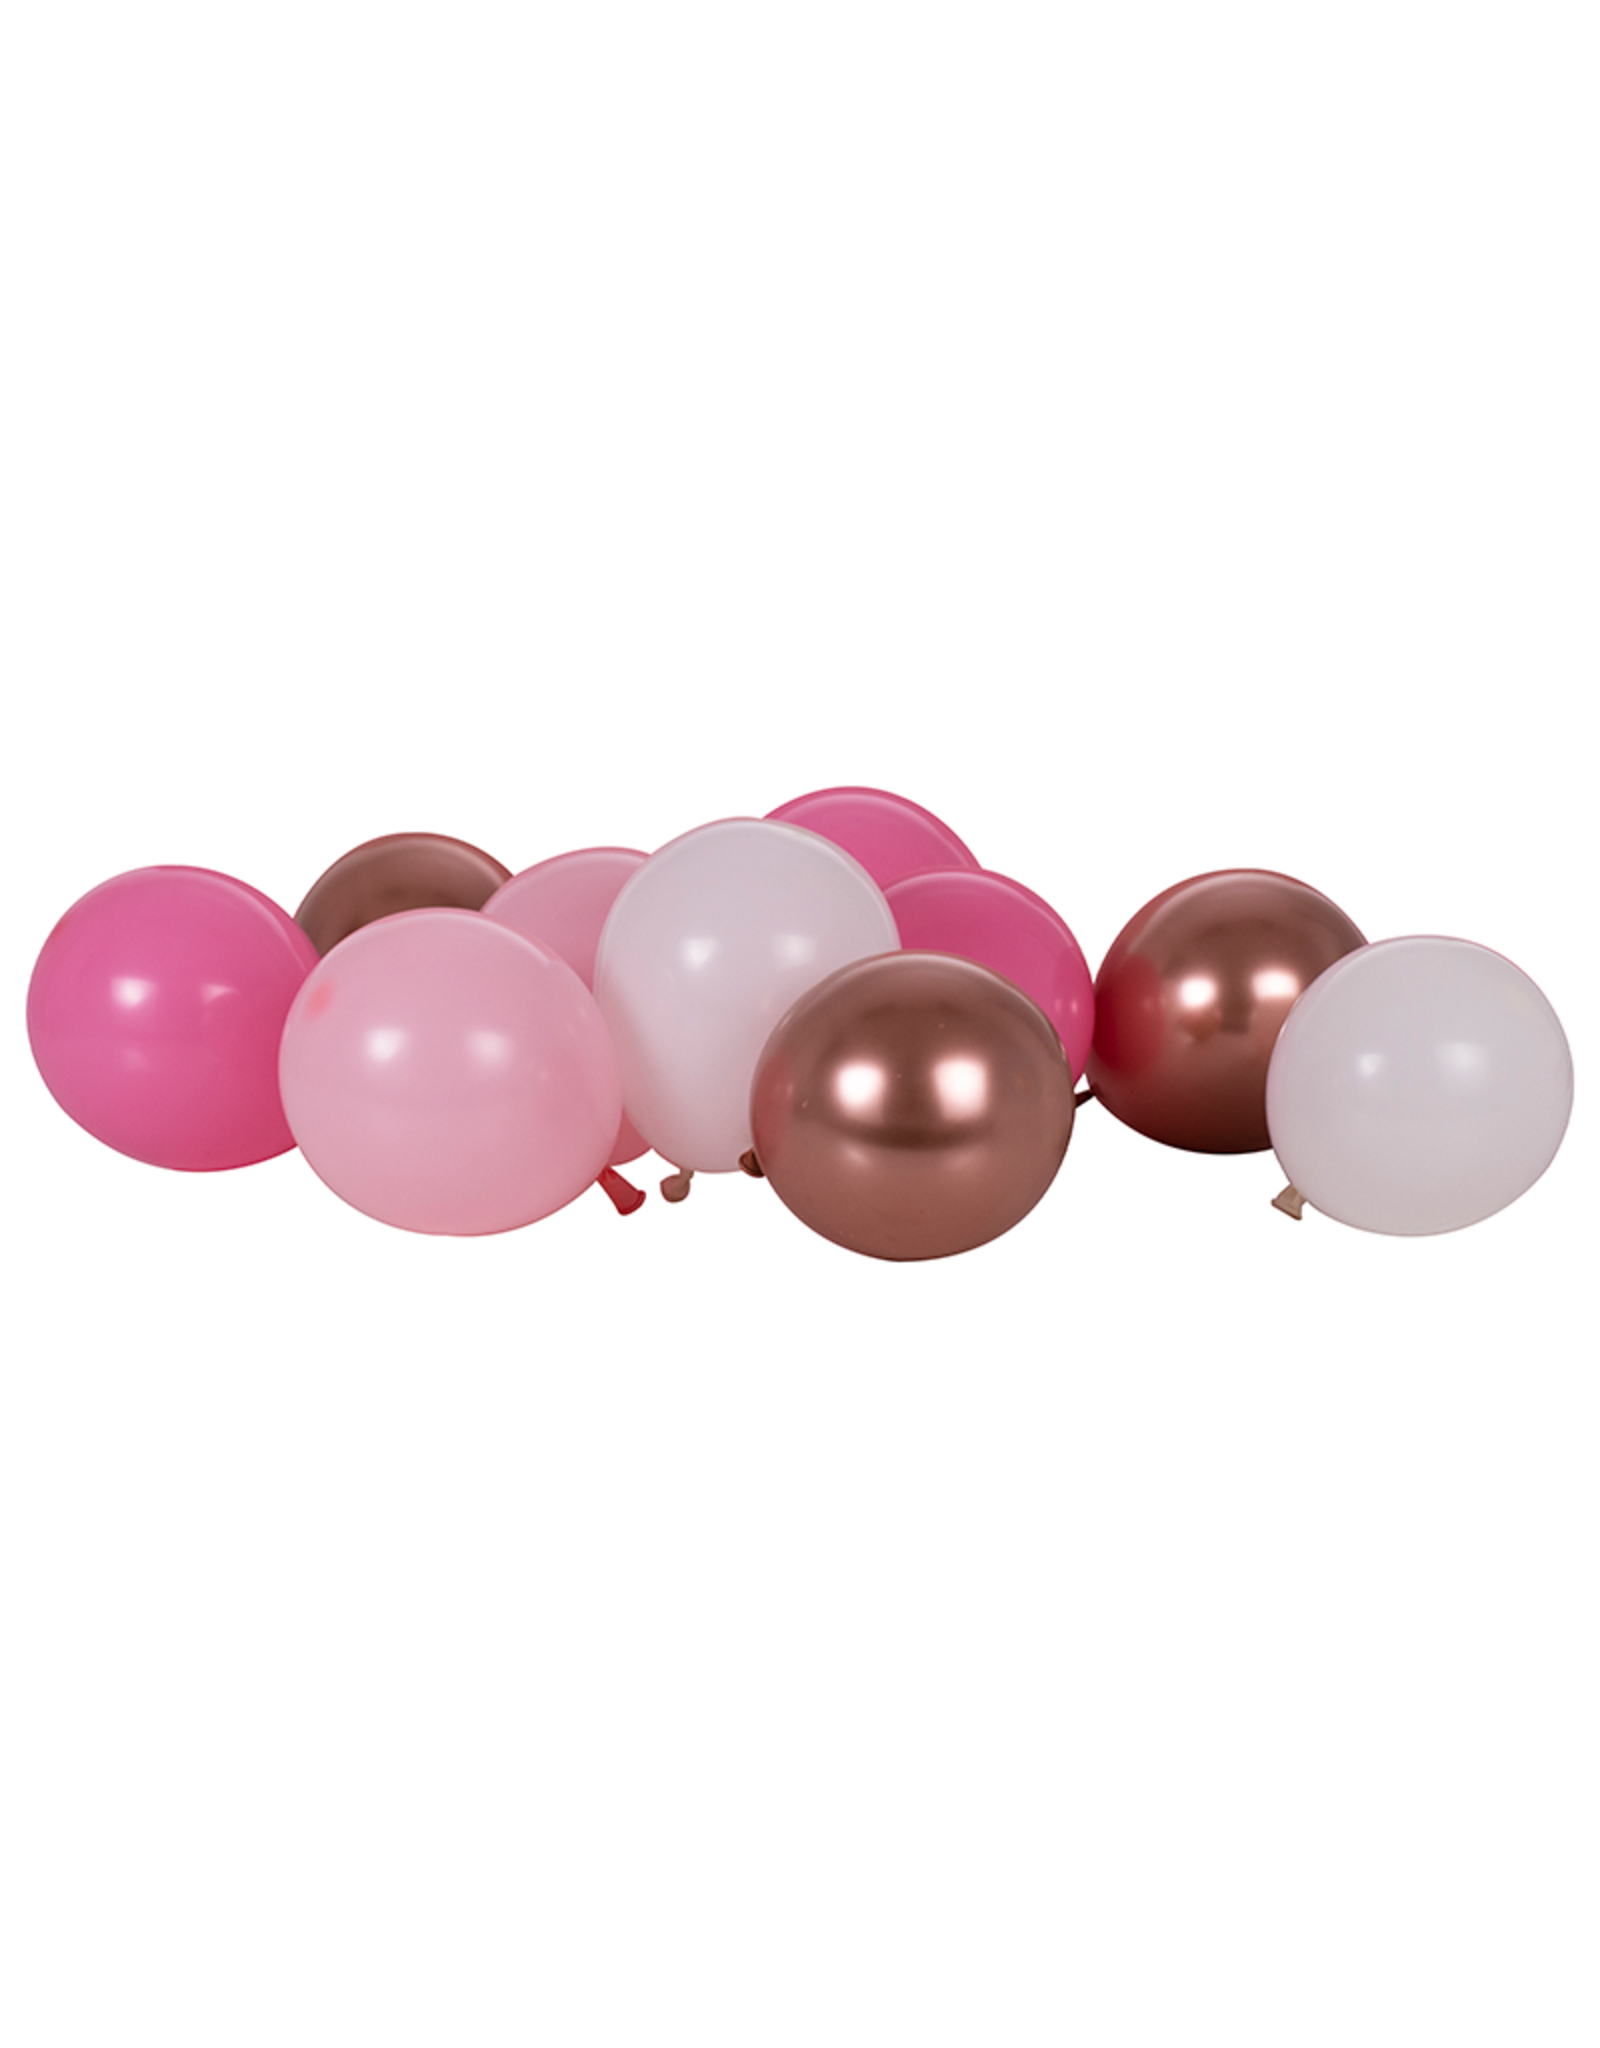 Ginger Ray Ballonnenmix rosé goud & roze | 40 stuks